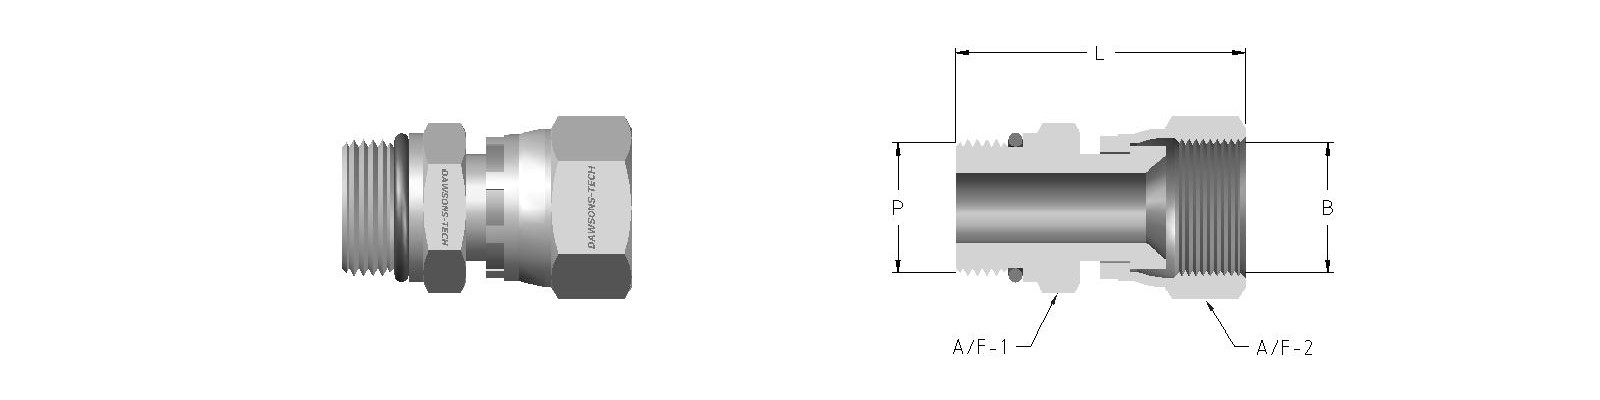 16 Swivel Male Connector (Male BSP Parallel Thread 'EO' to Swivel Nut)